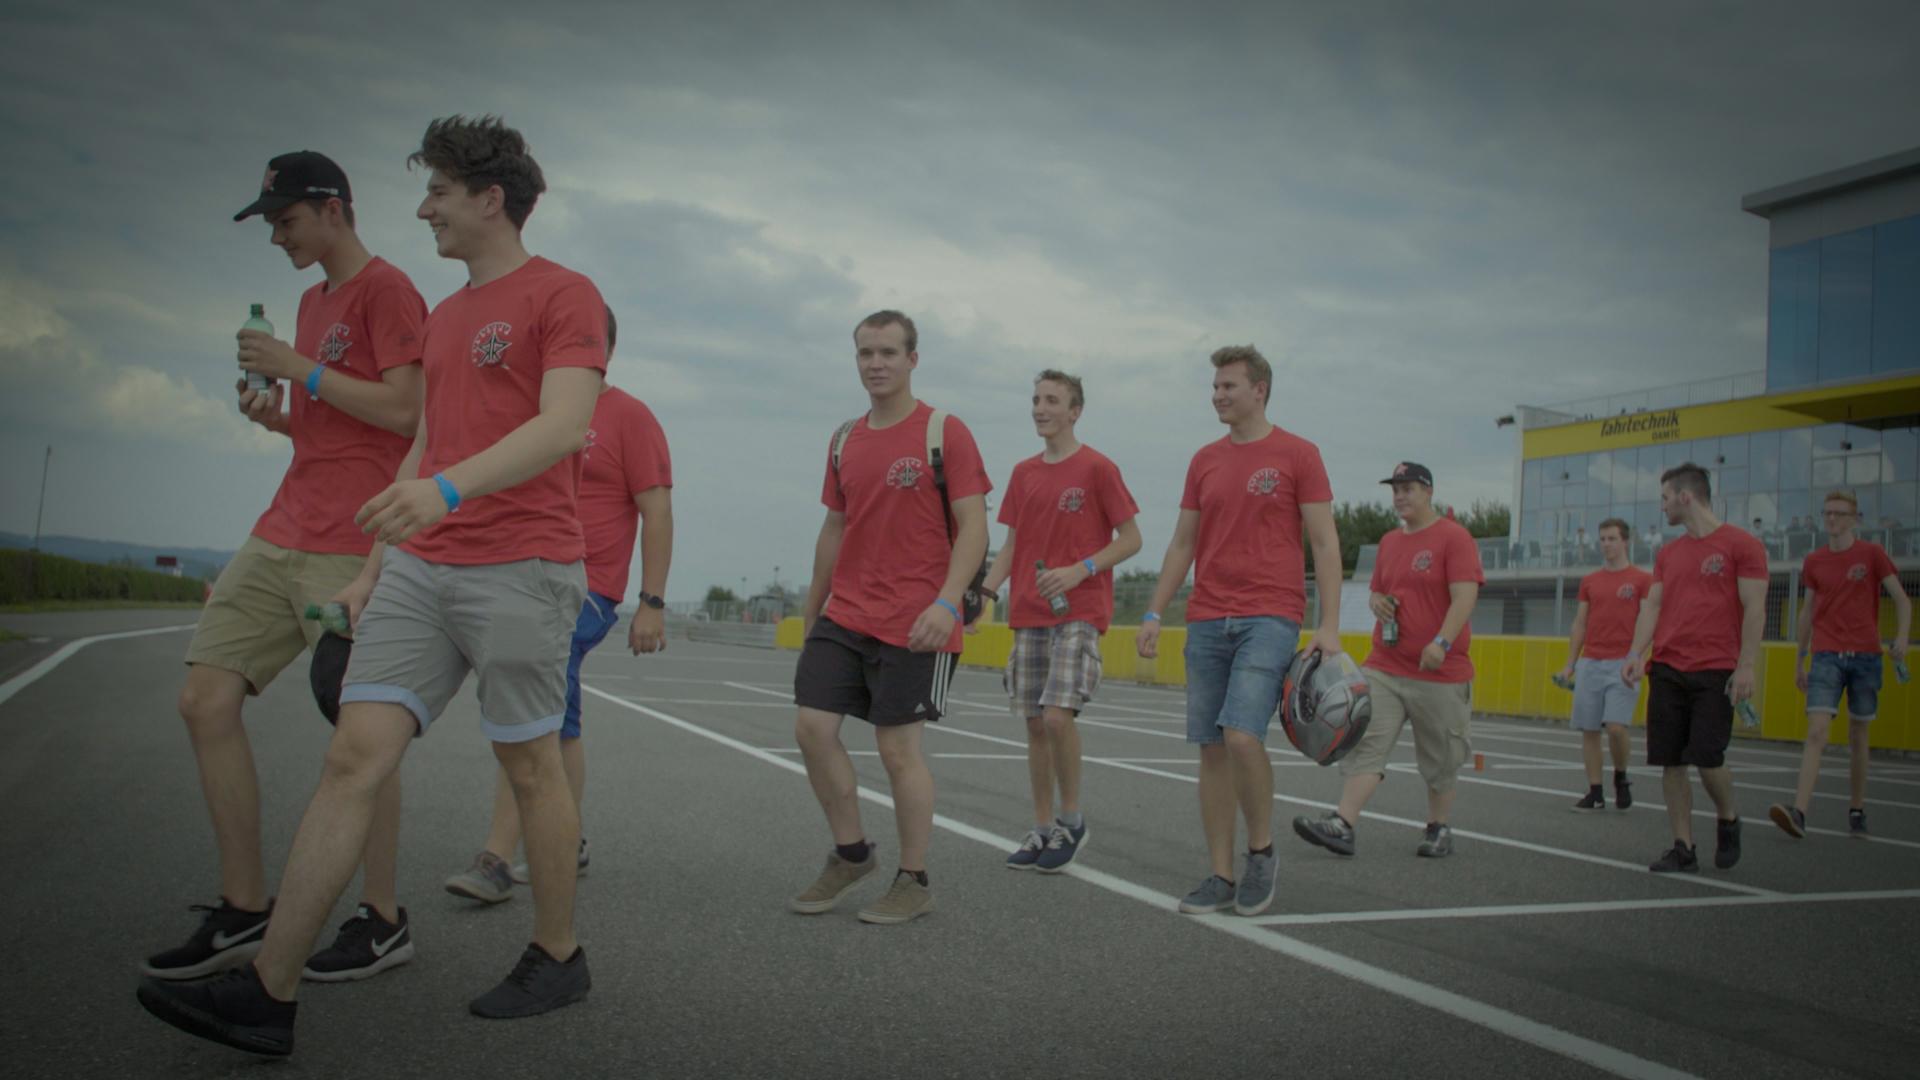 RacingRookie_2018_Vorausscheidung03_Melk_Screenshot_AUTrenalinMEDIA-24.jpg